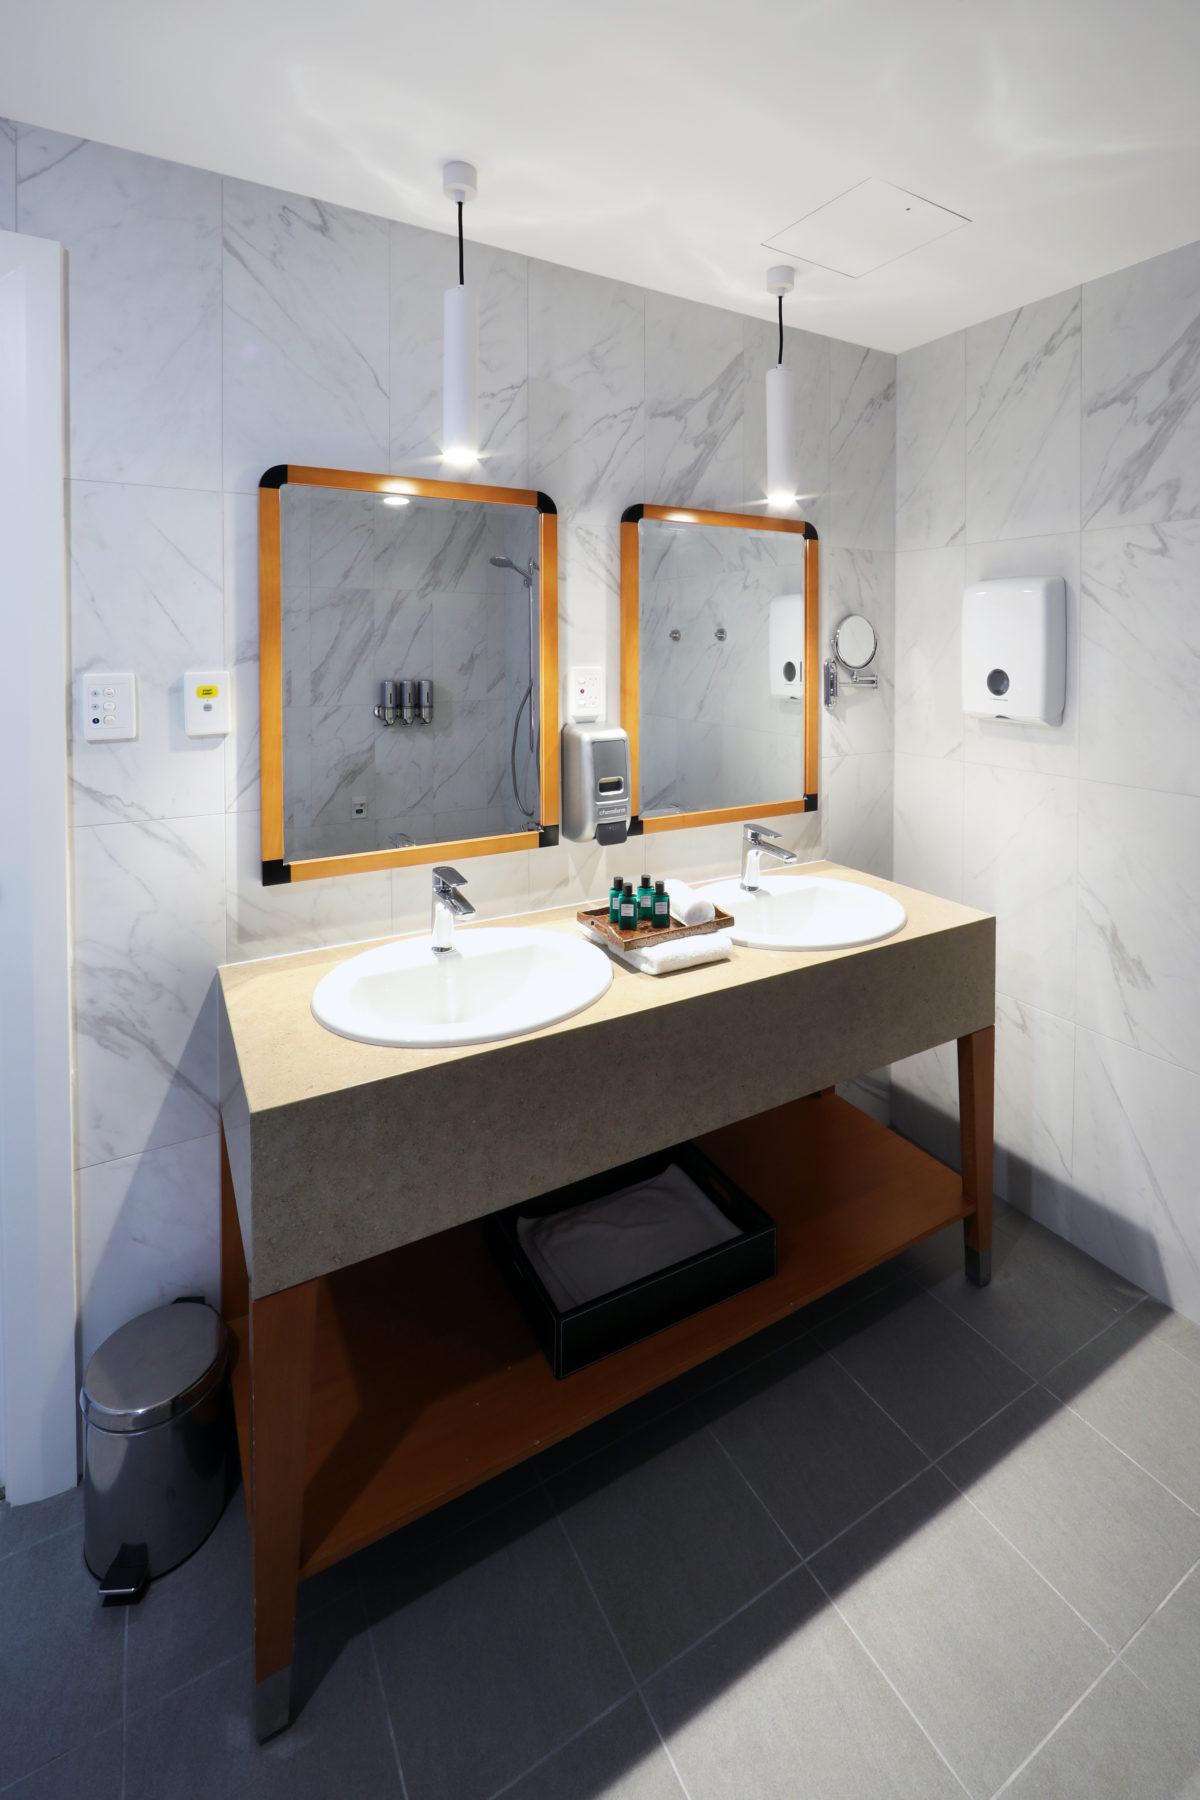 hotel bathroom with double sinks